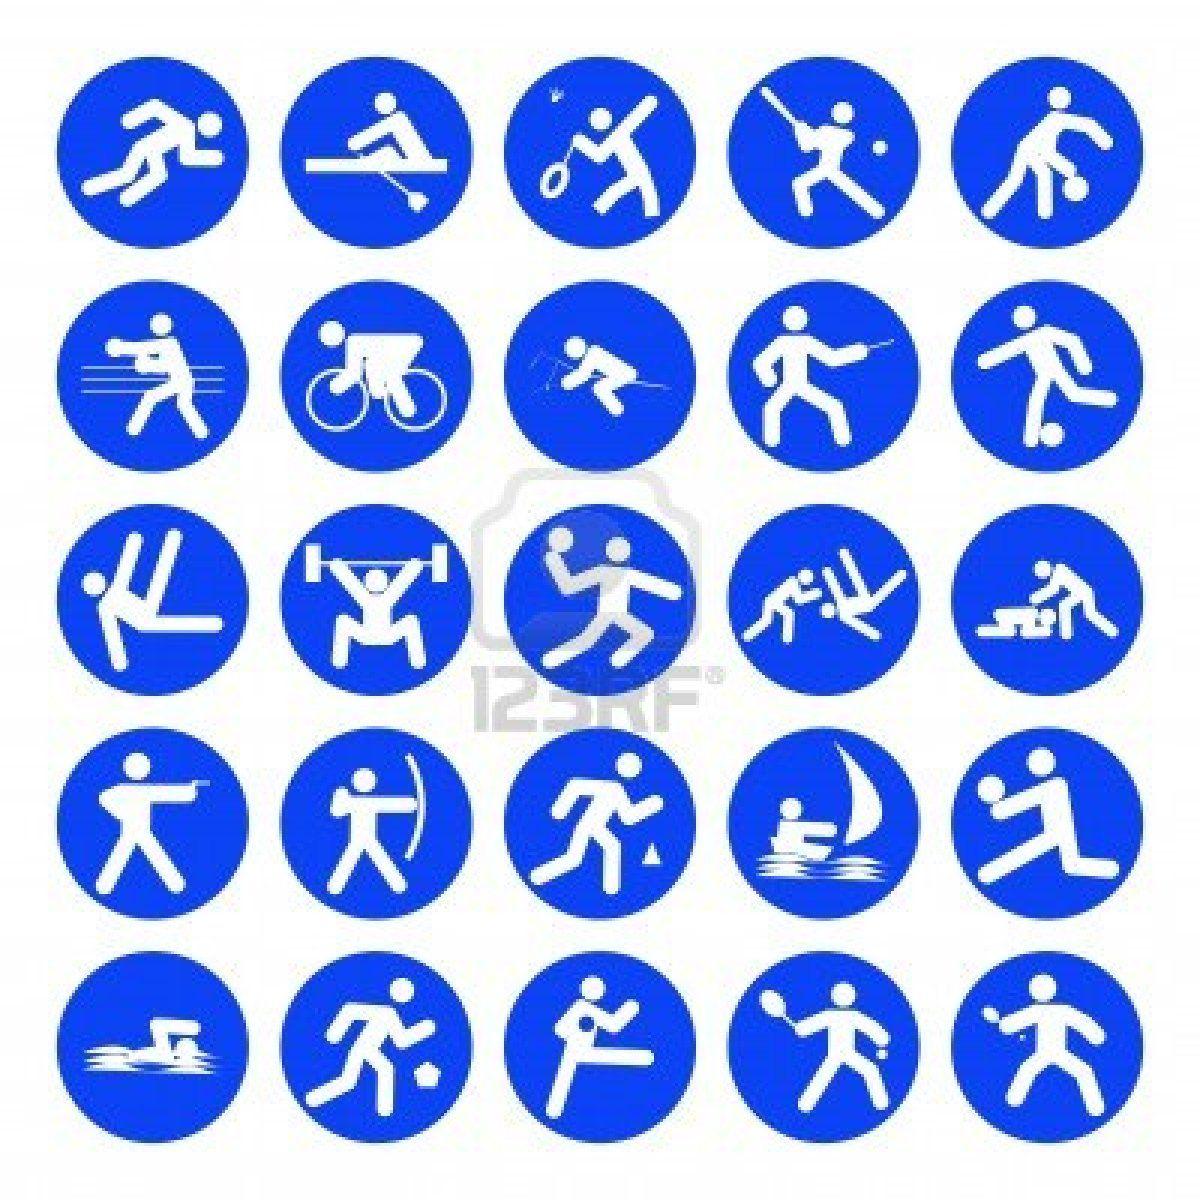 deportes - Buscar con Google